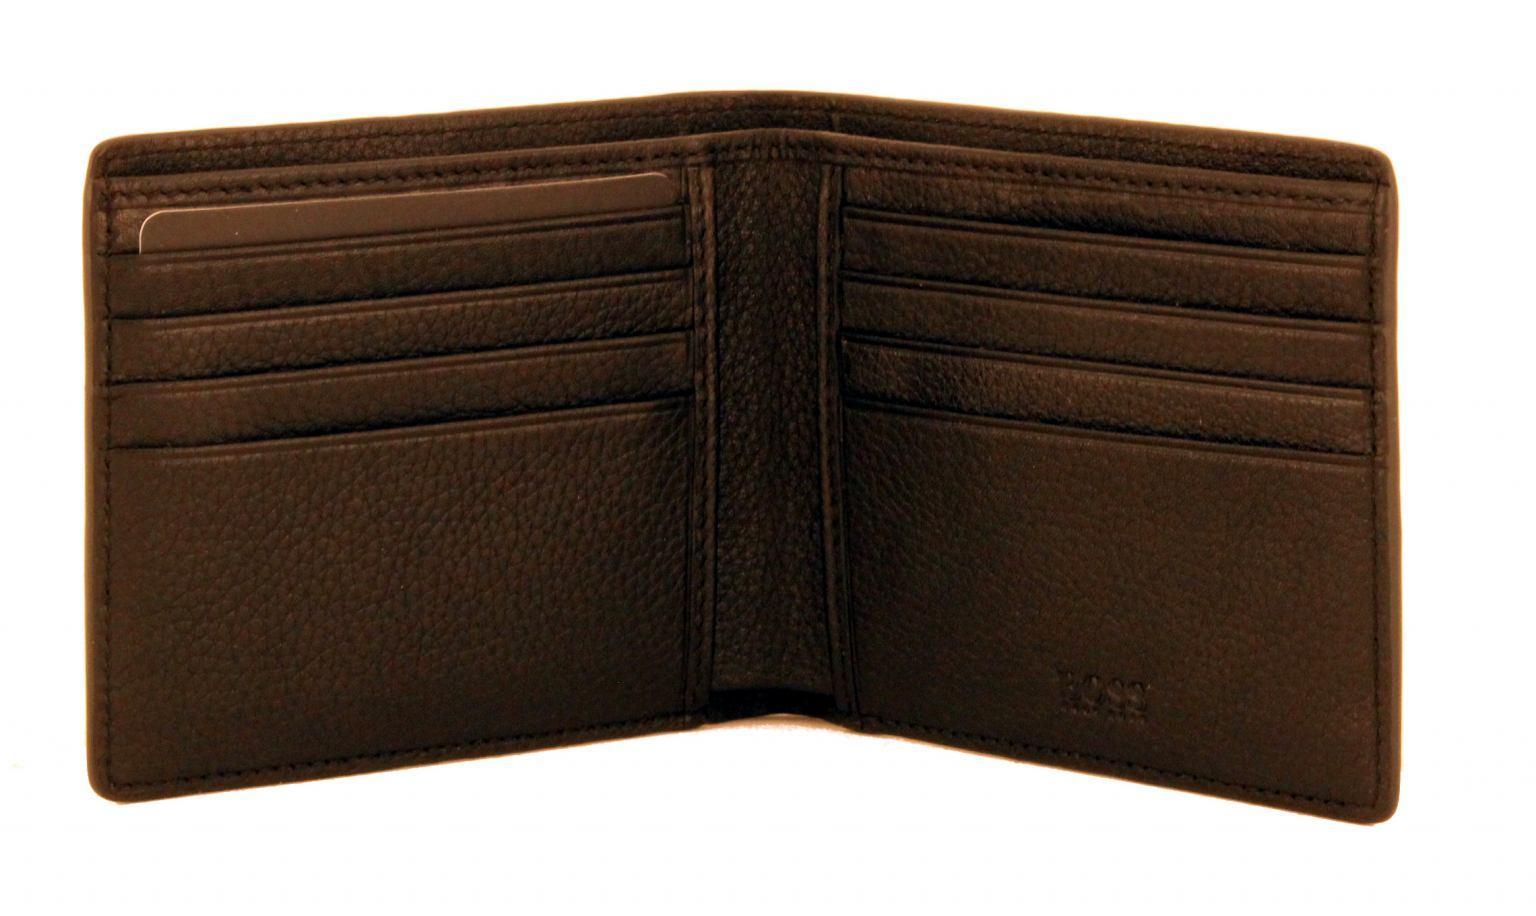 Hugo Boss Brieftasche ohne Hartgeldfach GbB17SR_8 cc Leder